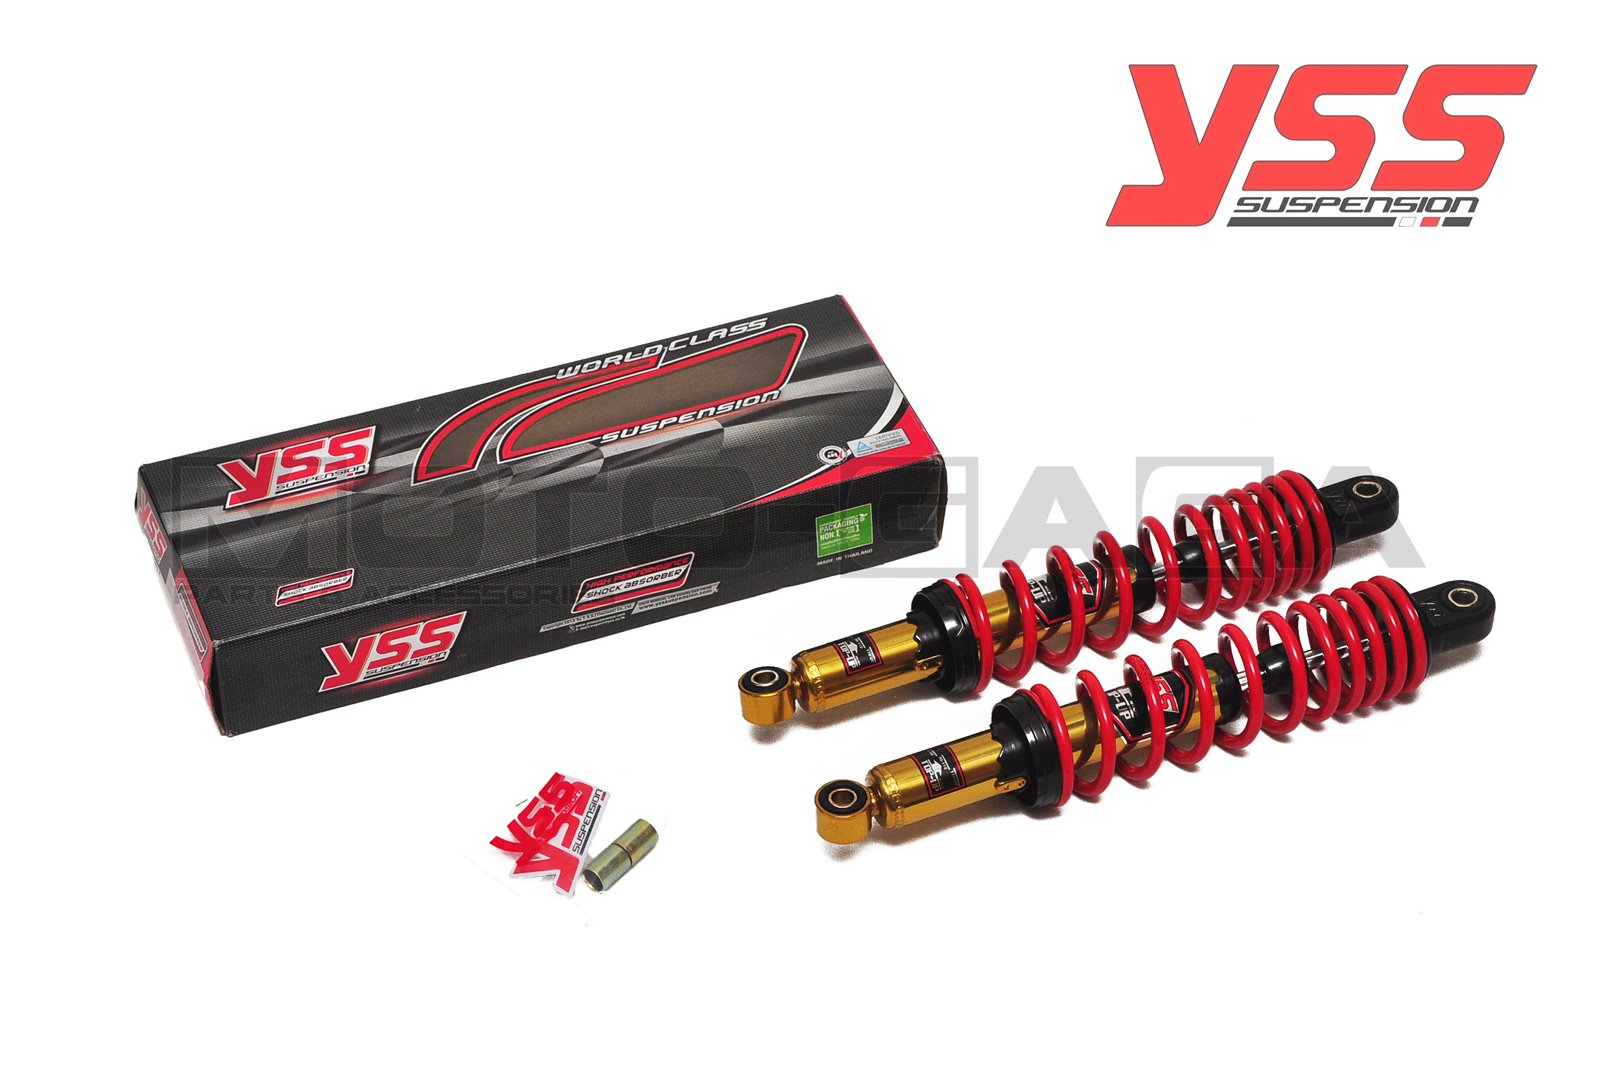 YSS TOP UP Dual Shock Absorbers (320mm) - Universal/Honda/Yamaha